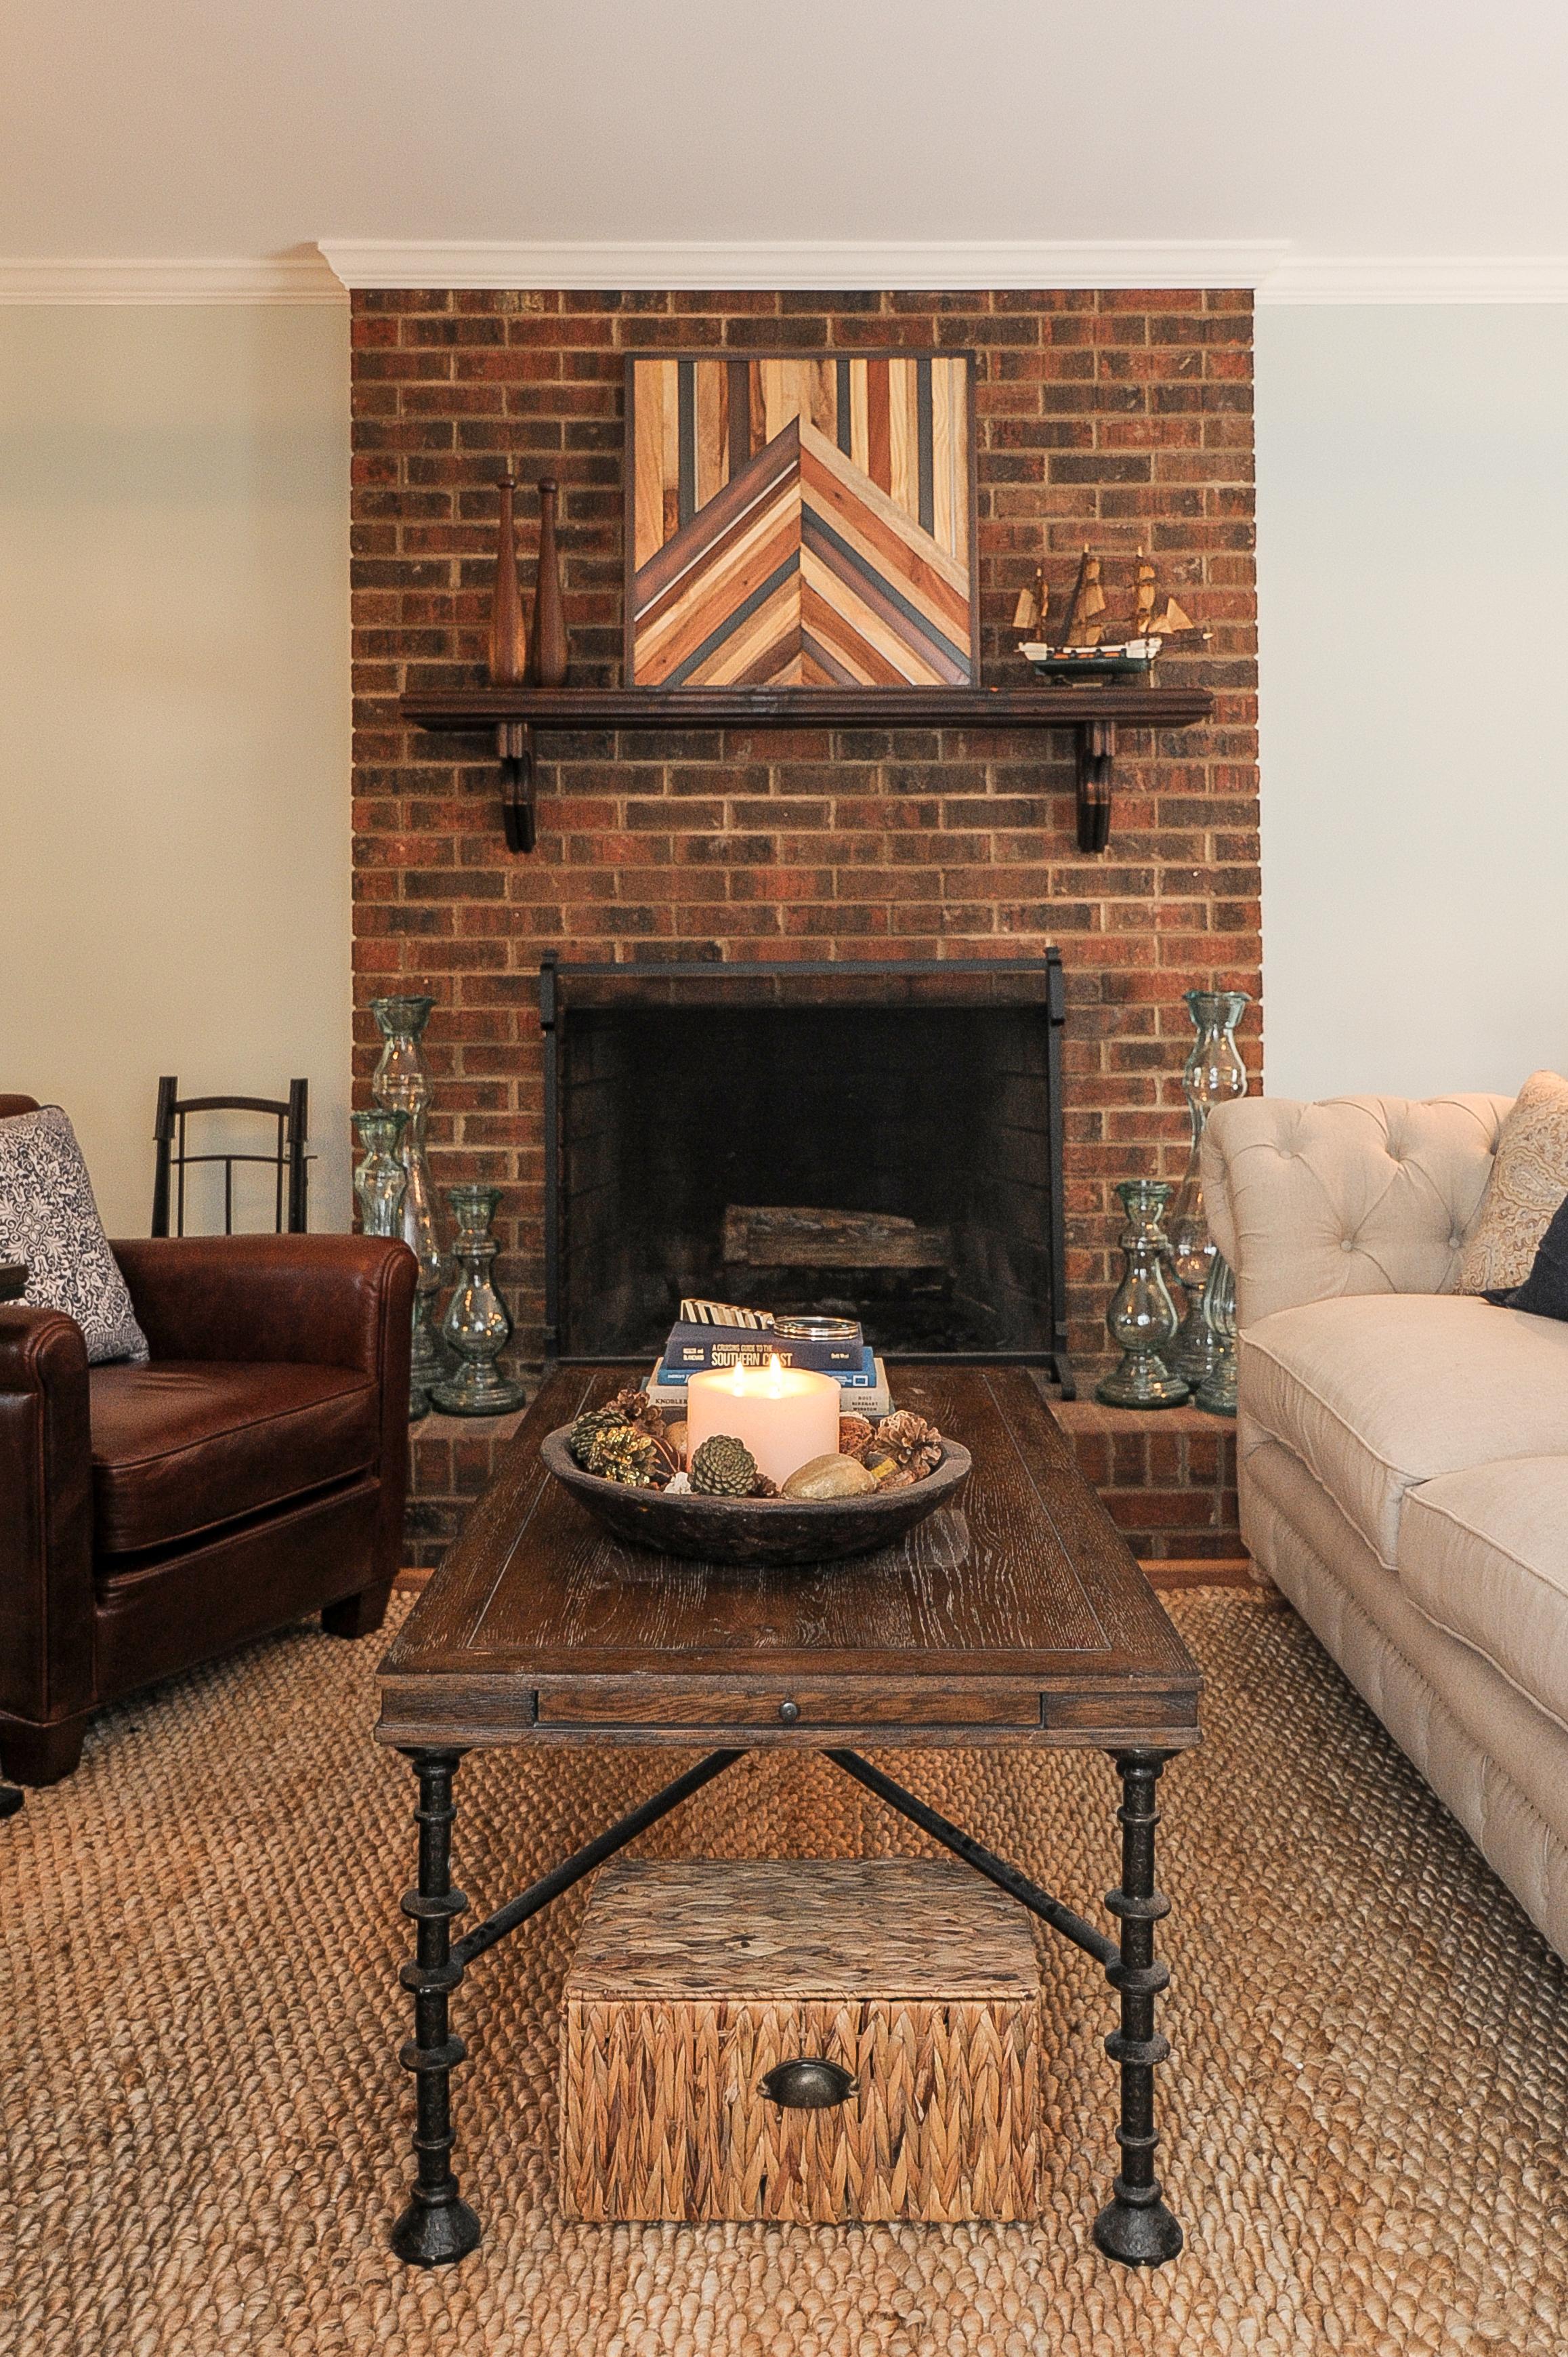 Artful Interiors - Bachelor Pad - Fireplace